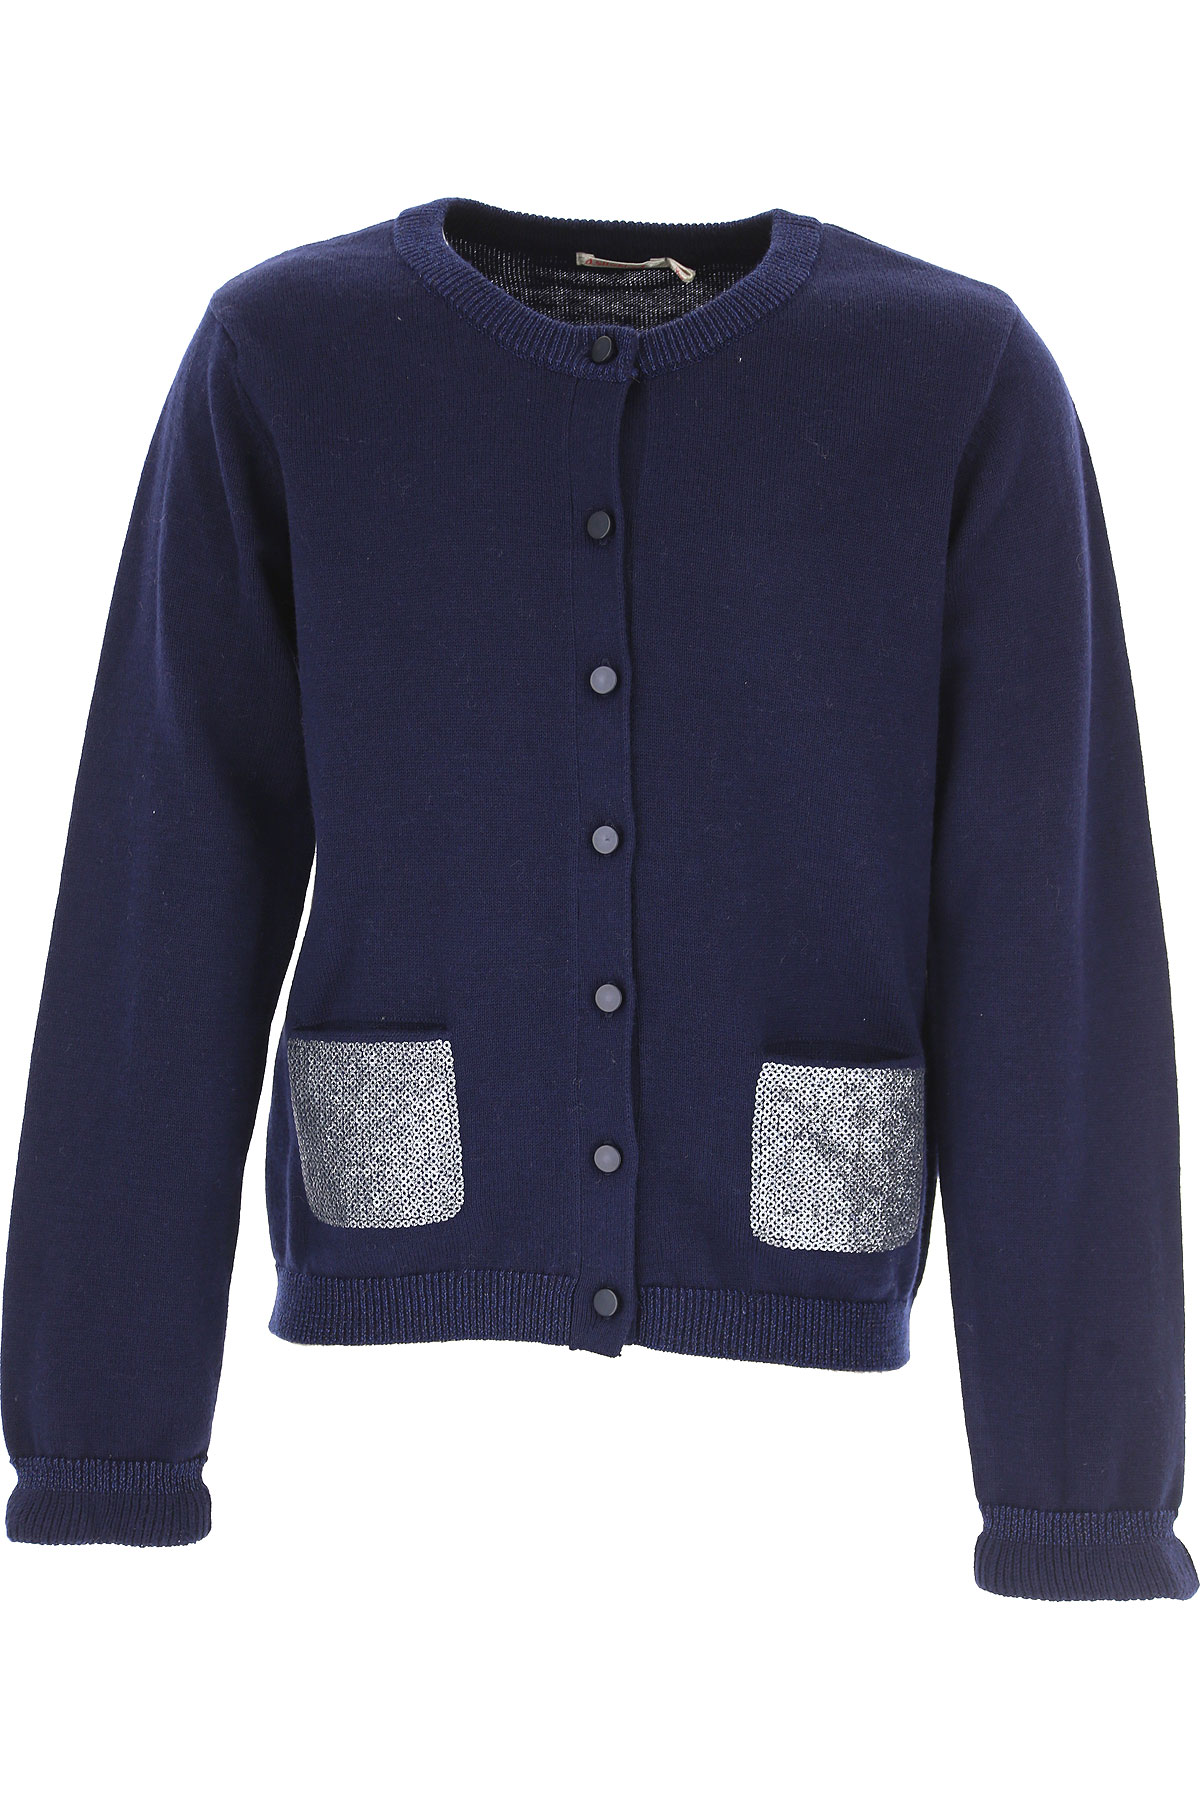 Image of Billieblush Kids Sweaters for Girls, Blue, Cotton, 2017, 10Y 4Y 6Y 8Y